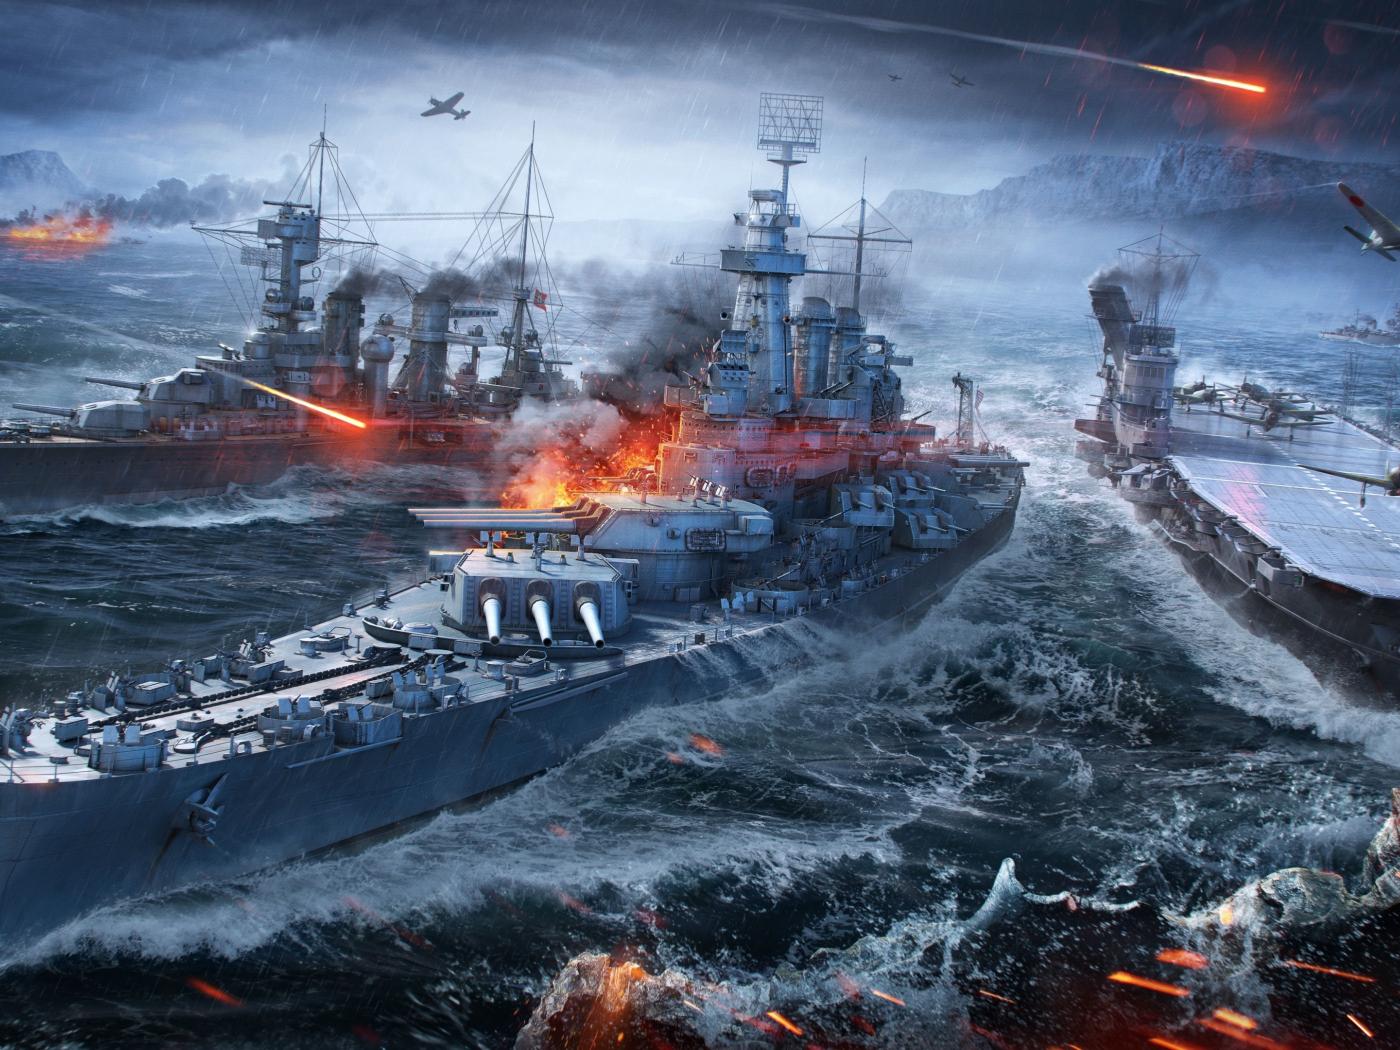 Download 1400x1050 wallpaper video game, warships, ships, world of warships, standard 4:3 ...